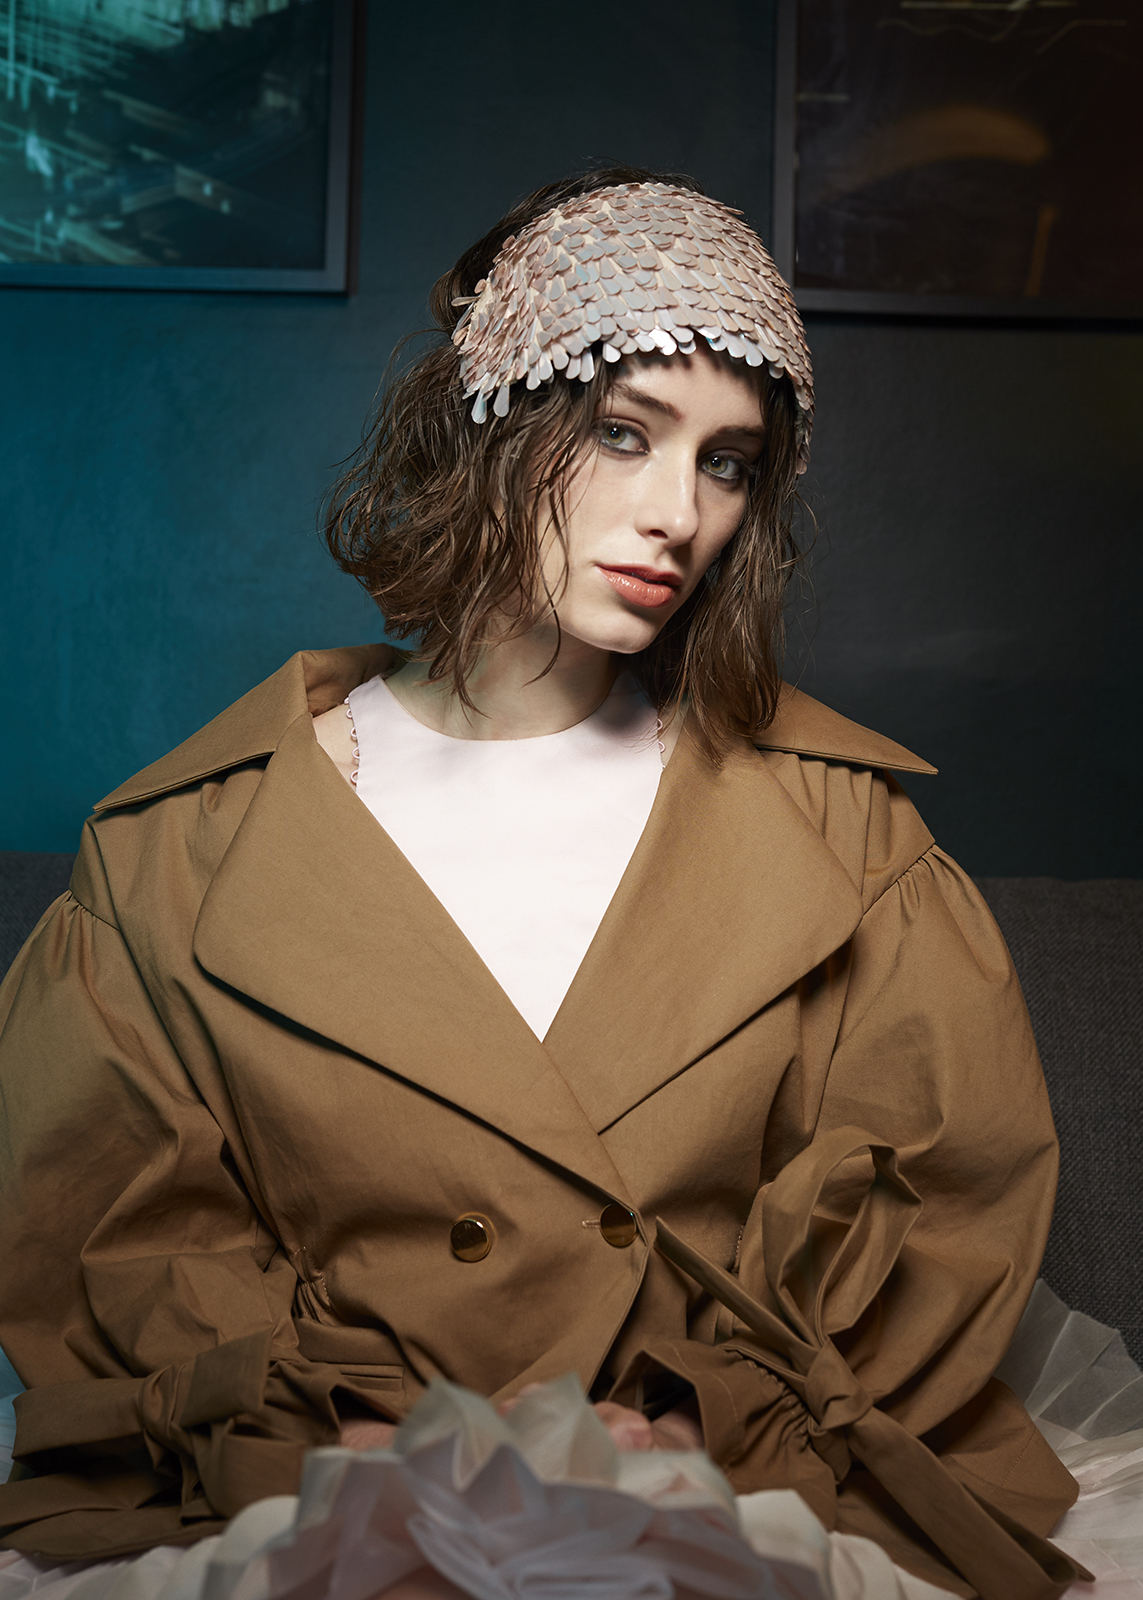 Jacket by Naya Rea  Dress by Tianyi Li  Headpiece by Merve Bayindir